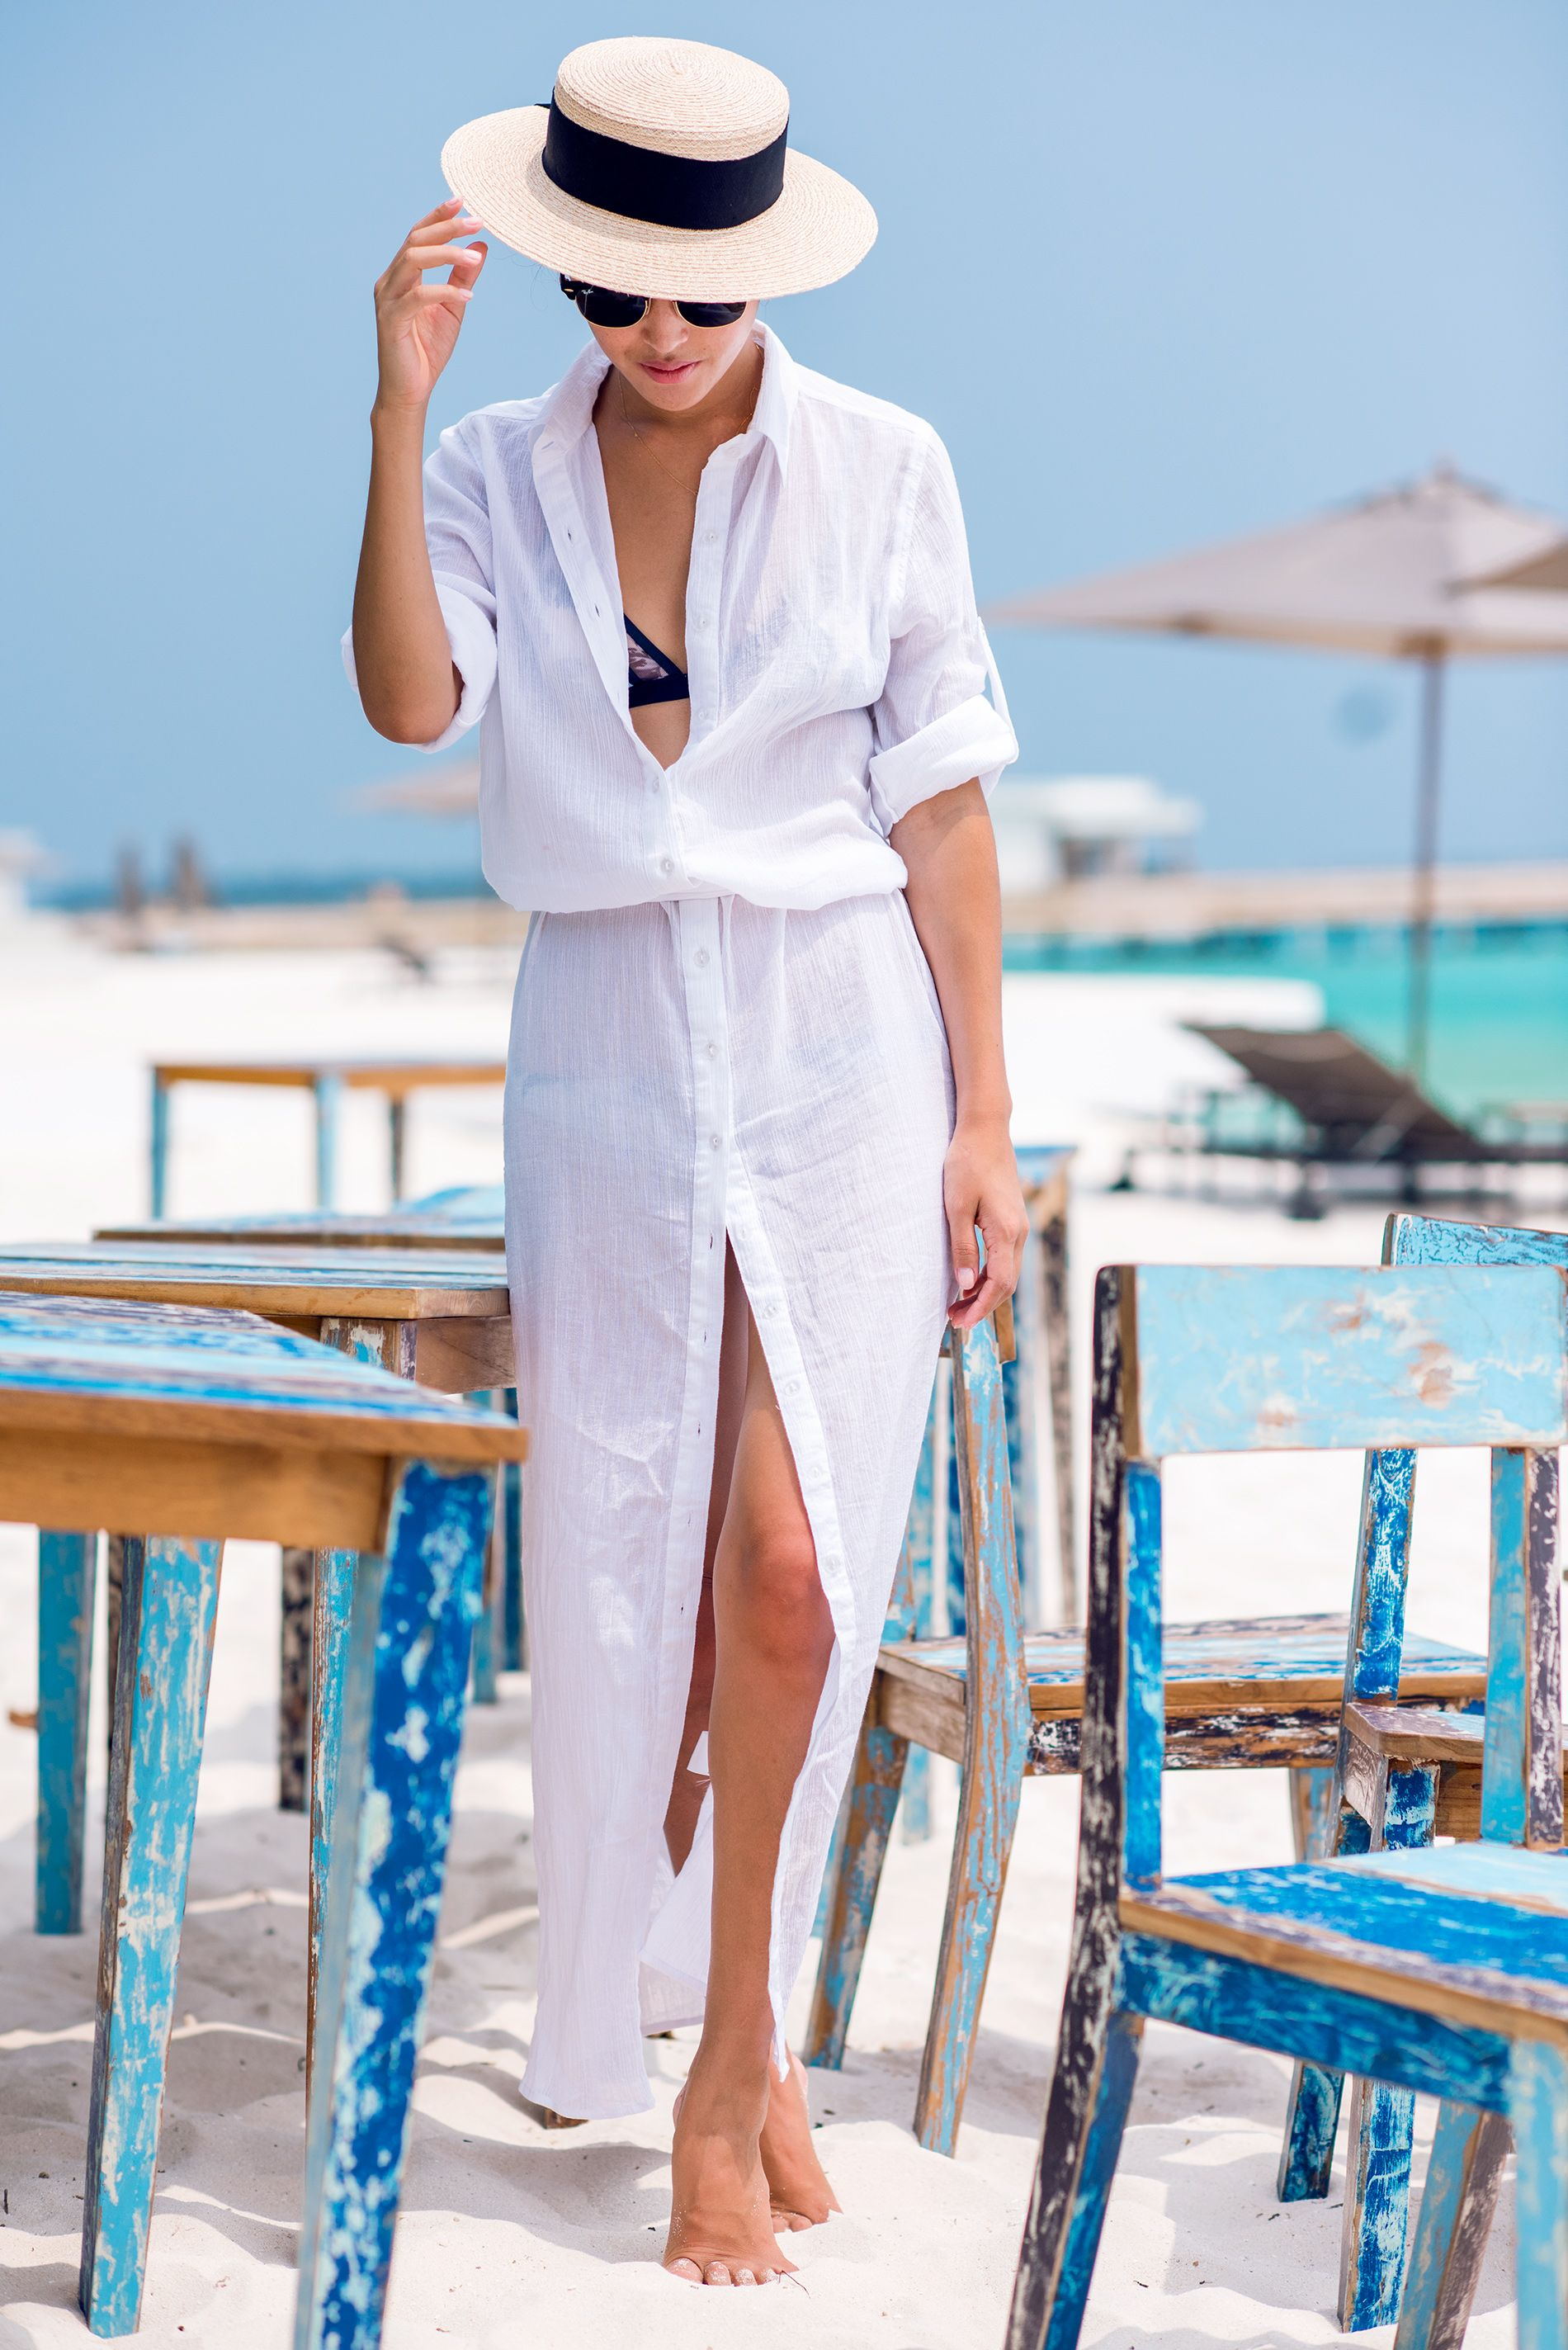 974b67fb0f8 White-Summer-Maxi-Shirt-Dress-Nicole Warne-8